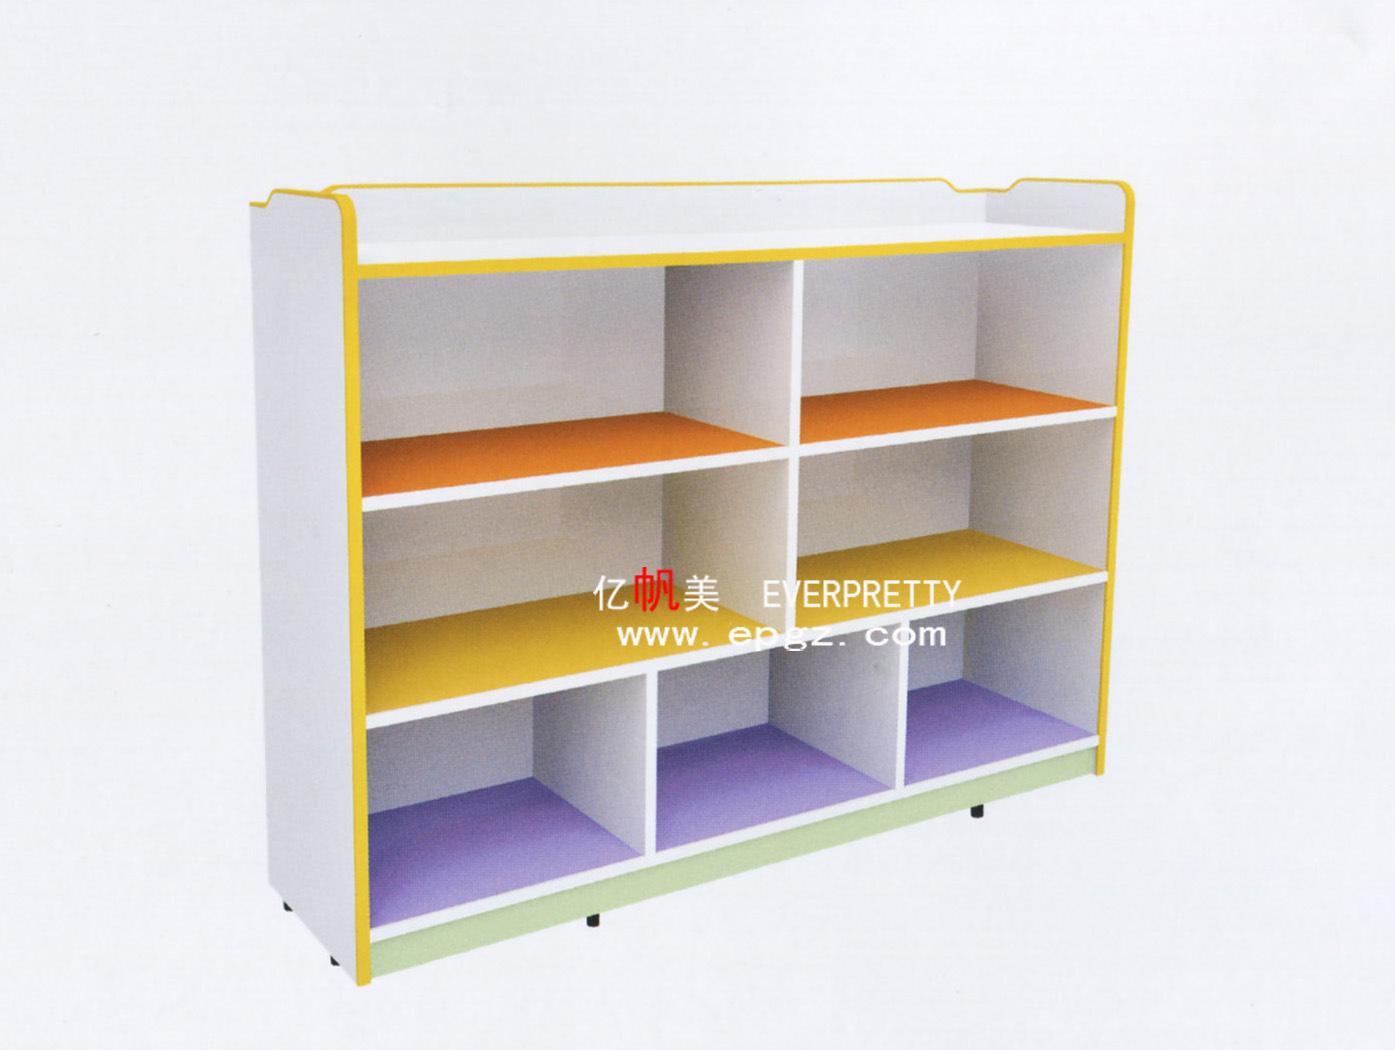 Best Of 14 Images For Kids Storage Cabinets Homes Alternative 11313